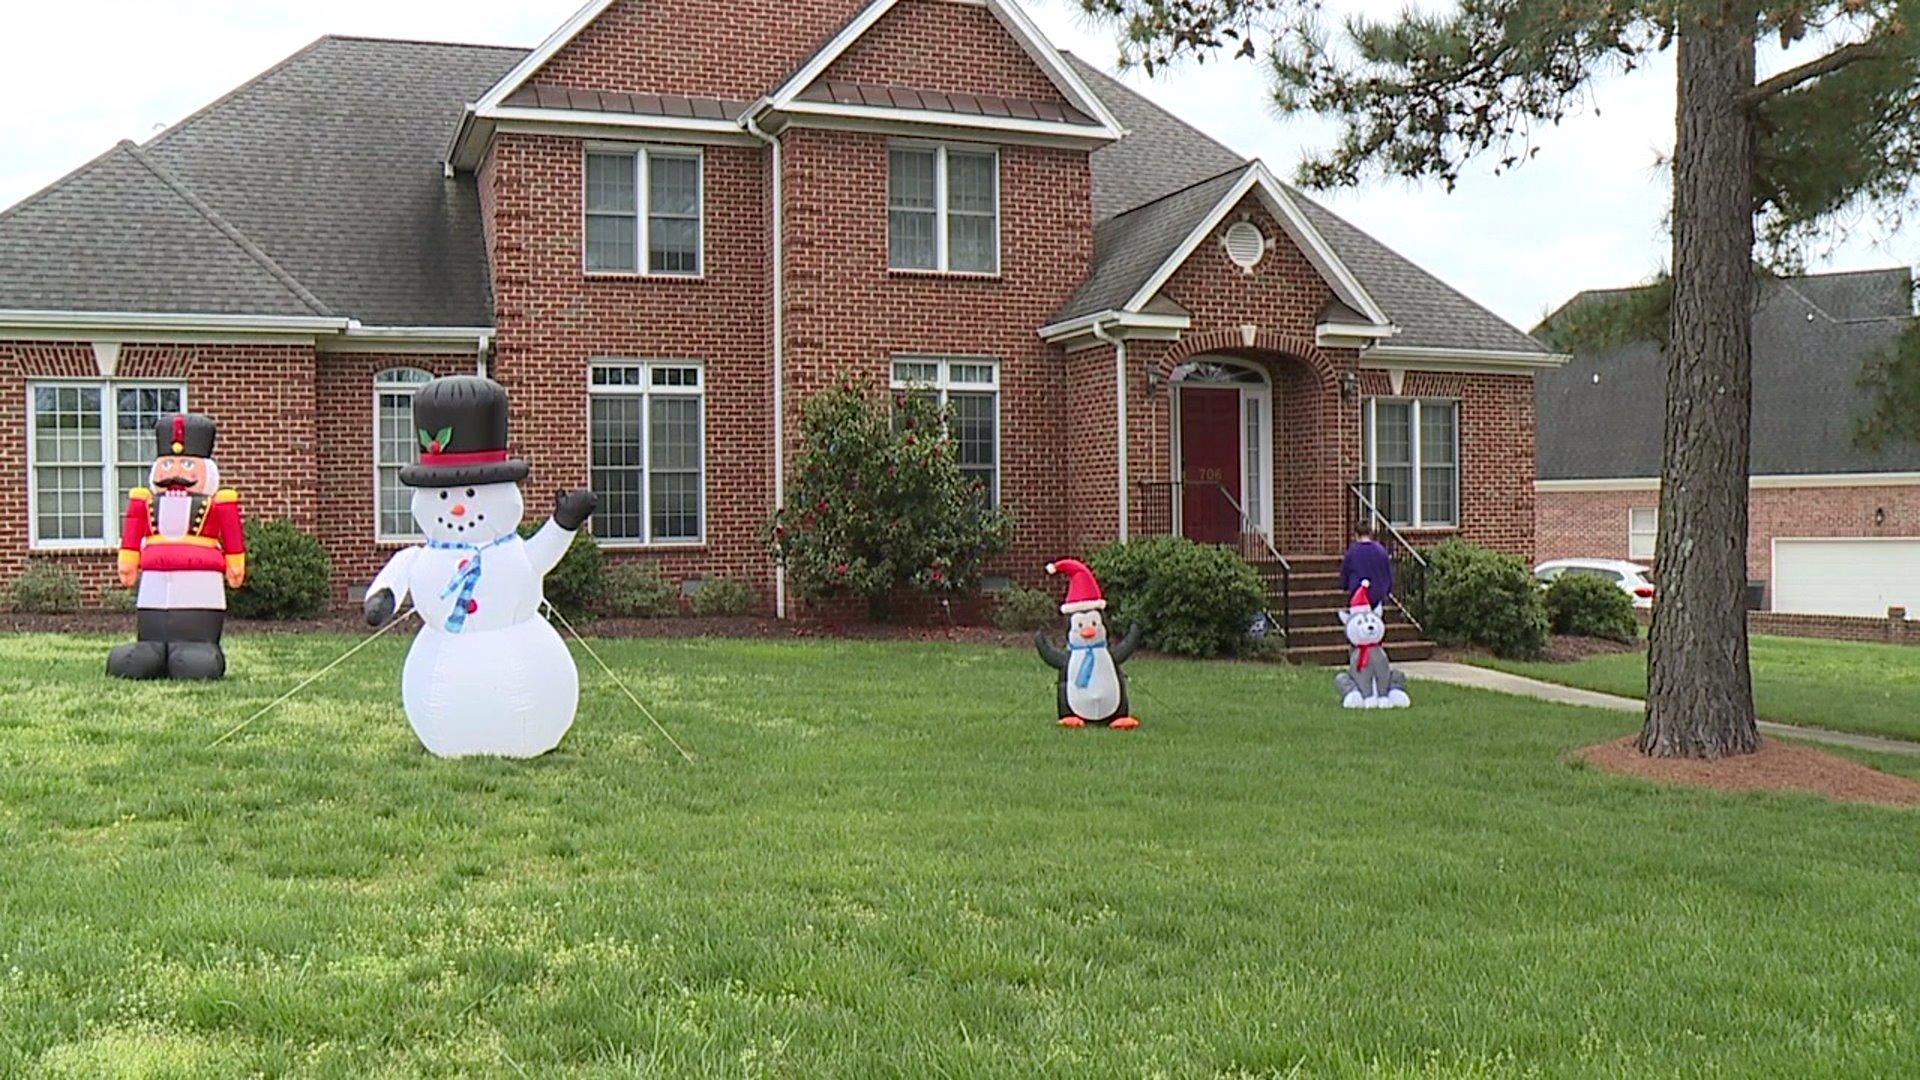 Burlington neighbors put up Christmas decorations to spread cheer amid coronavirus outbreak